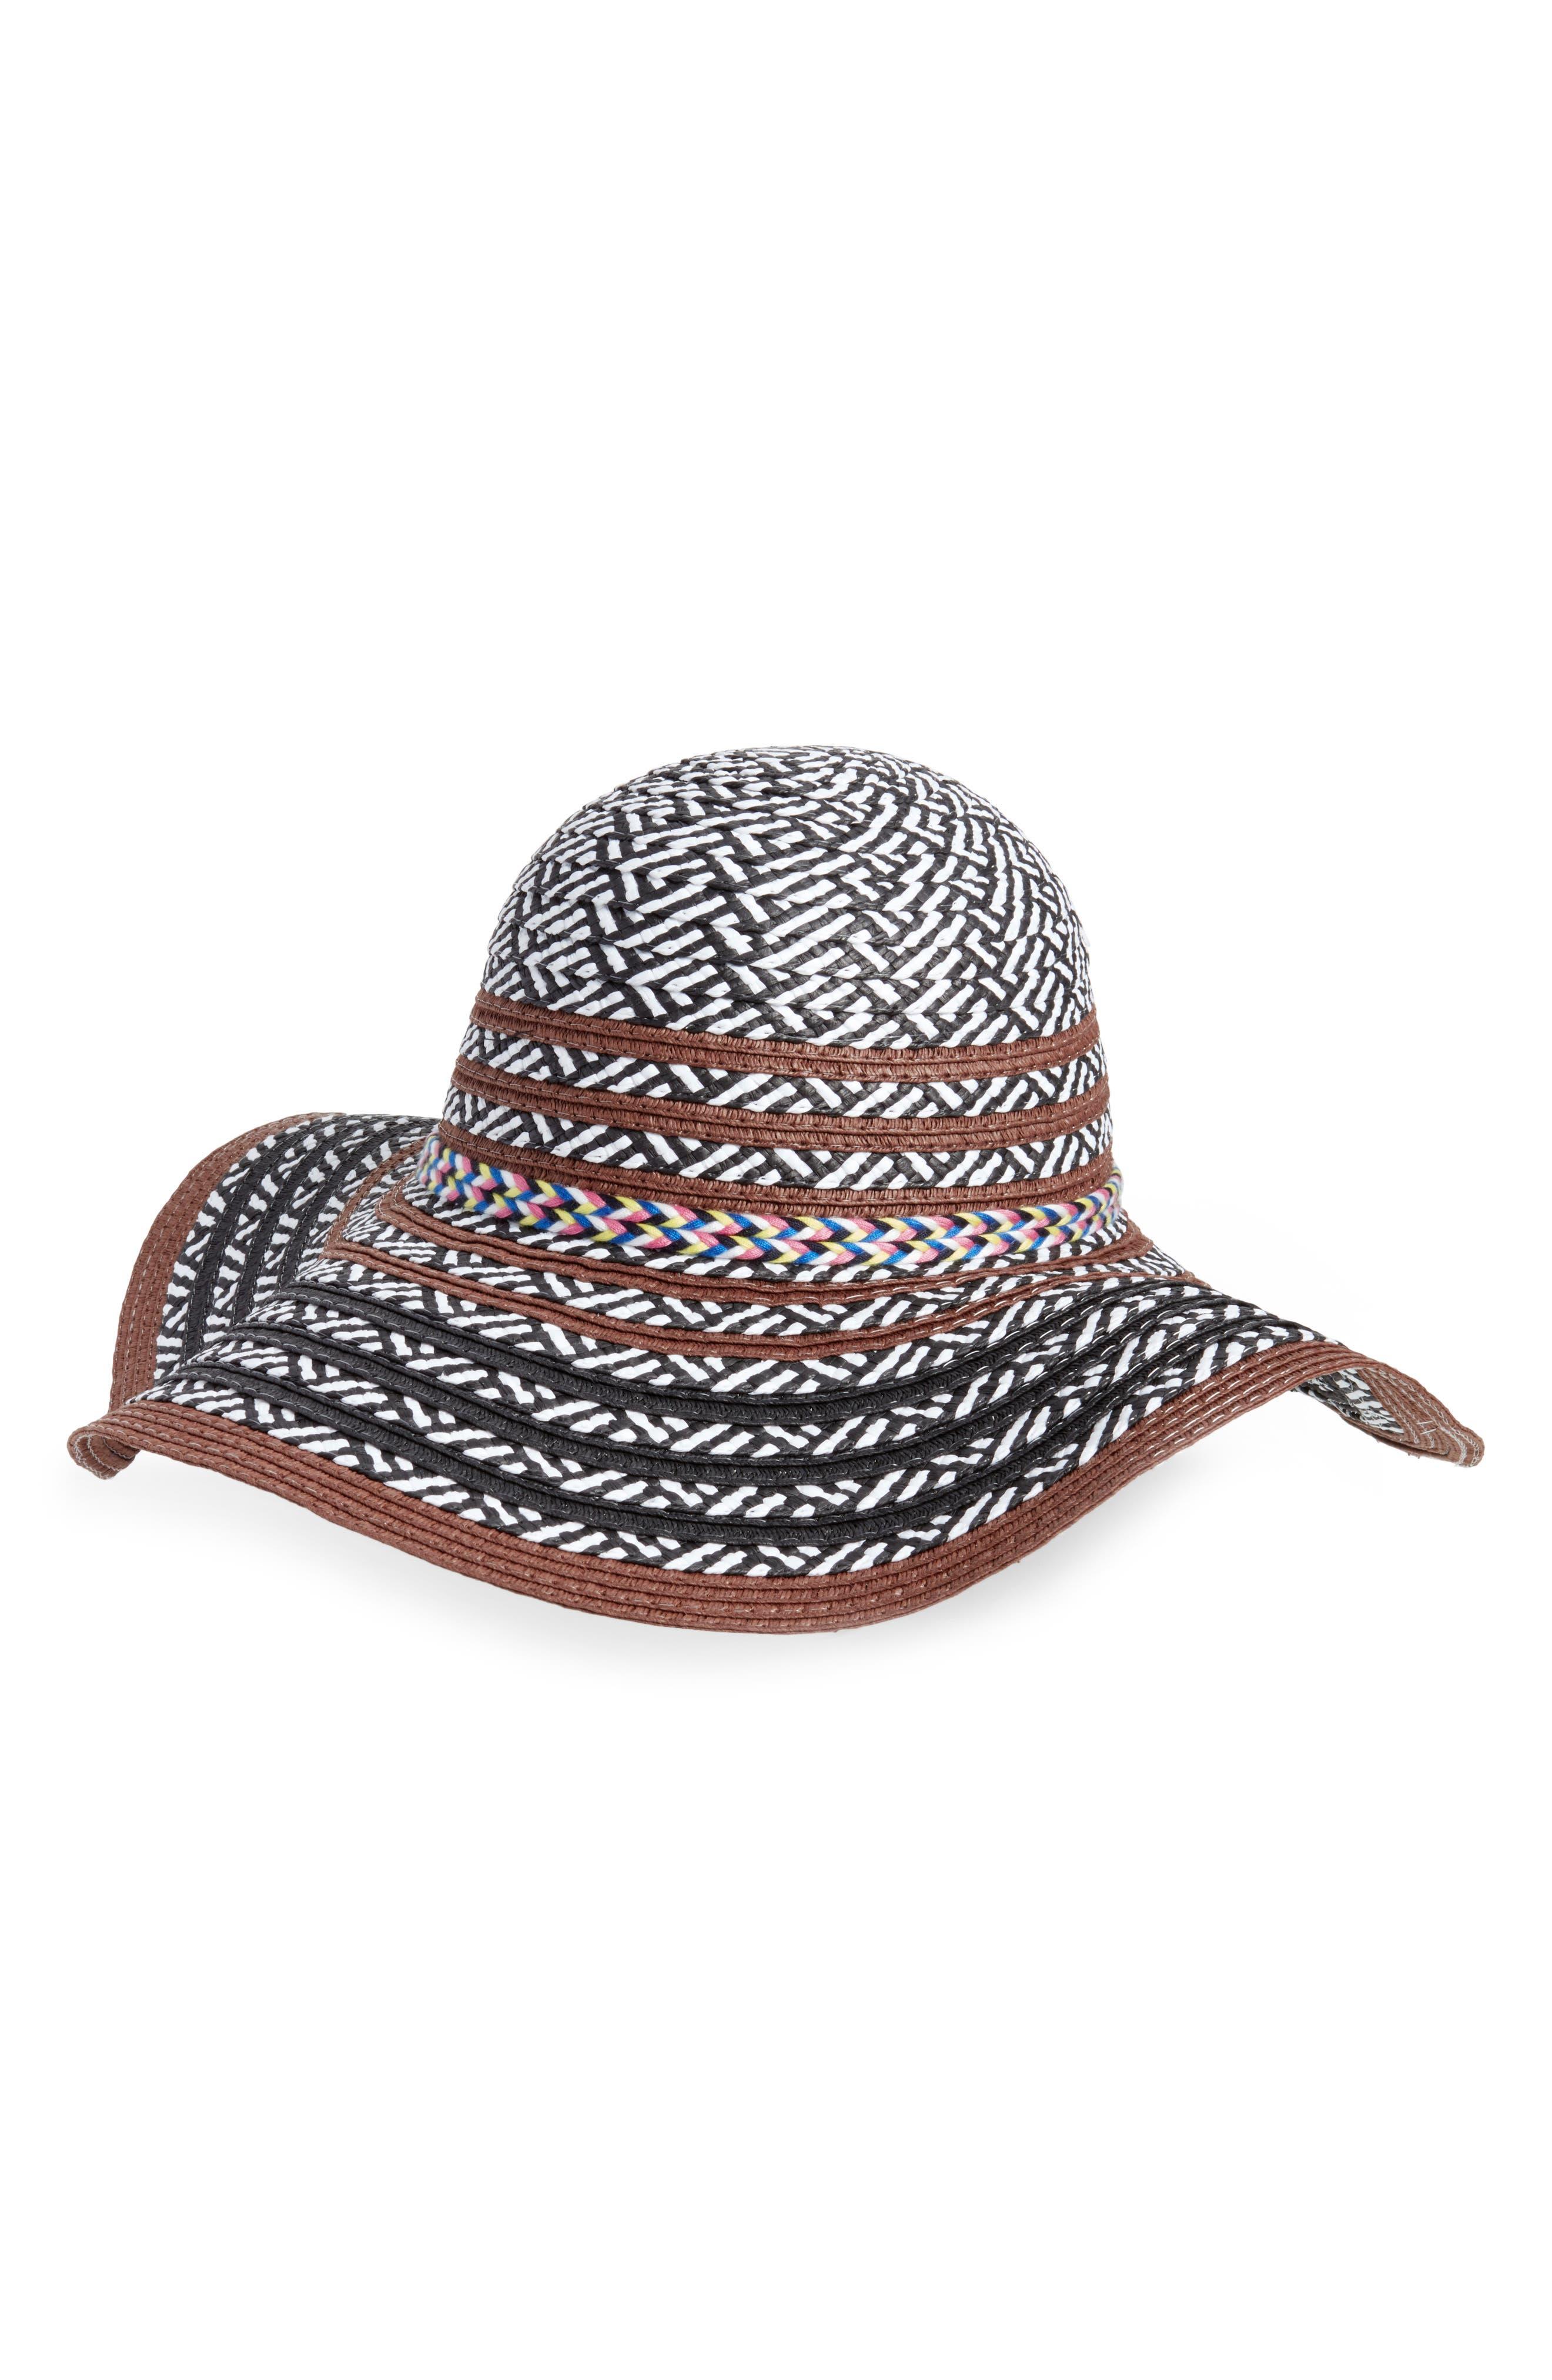 Beach Party Floppy Hat,                             Main thumbnail 1, color,